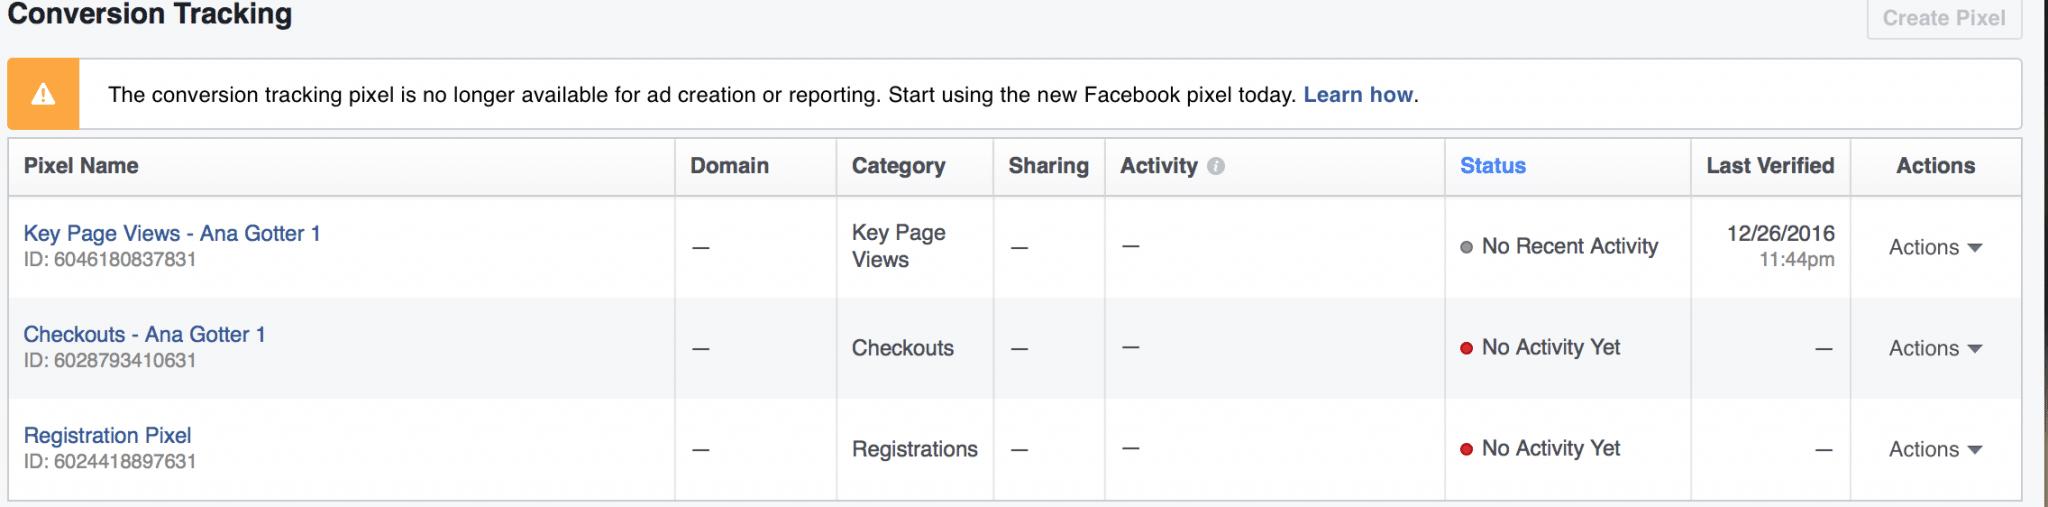 new conversion pixel Facebook